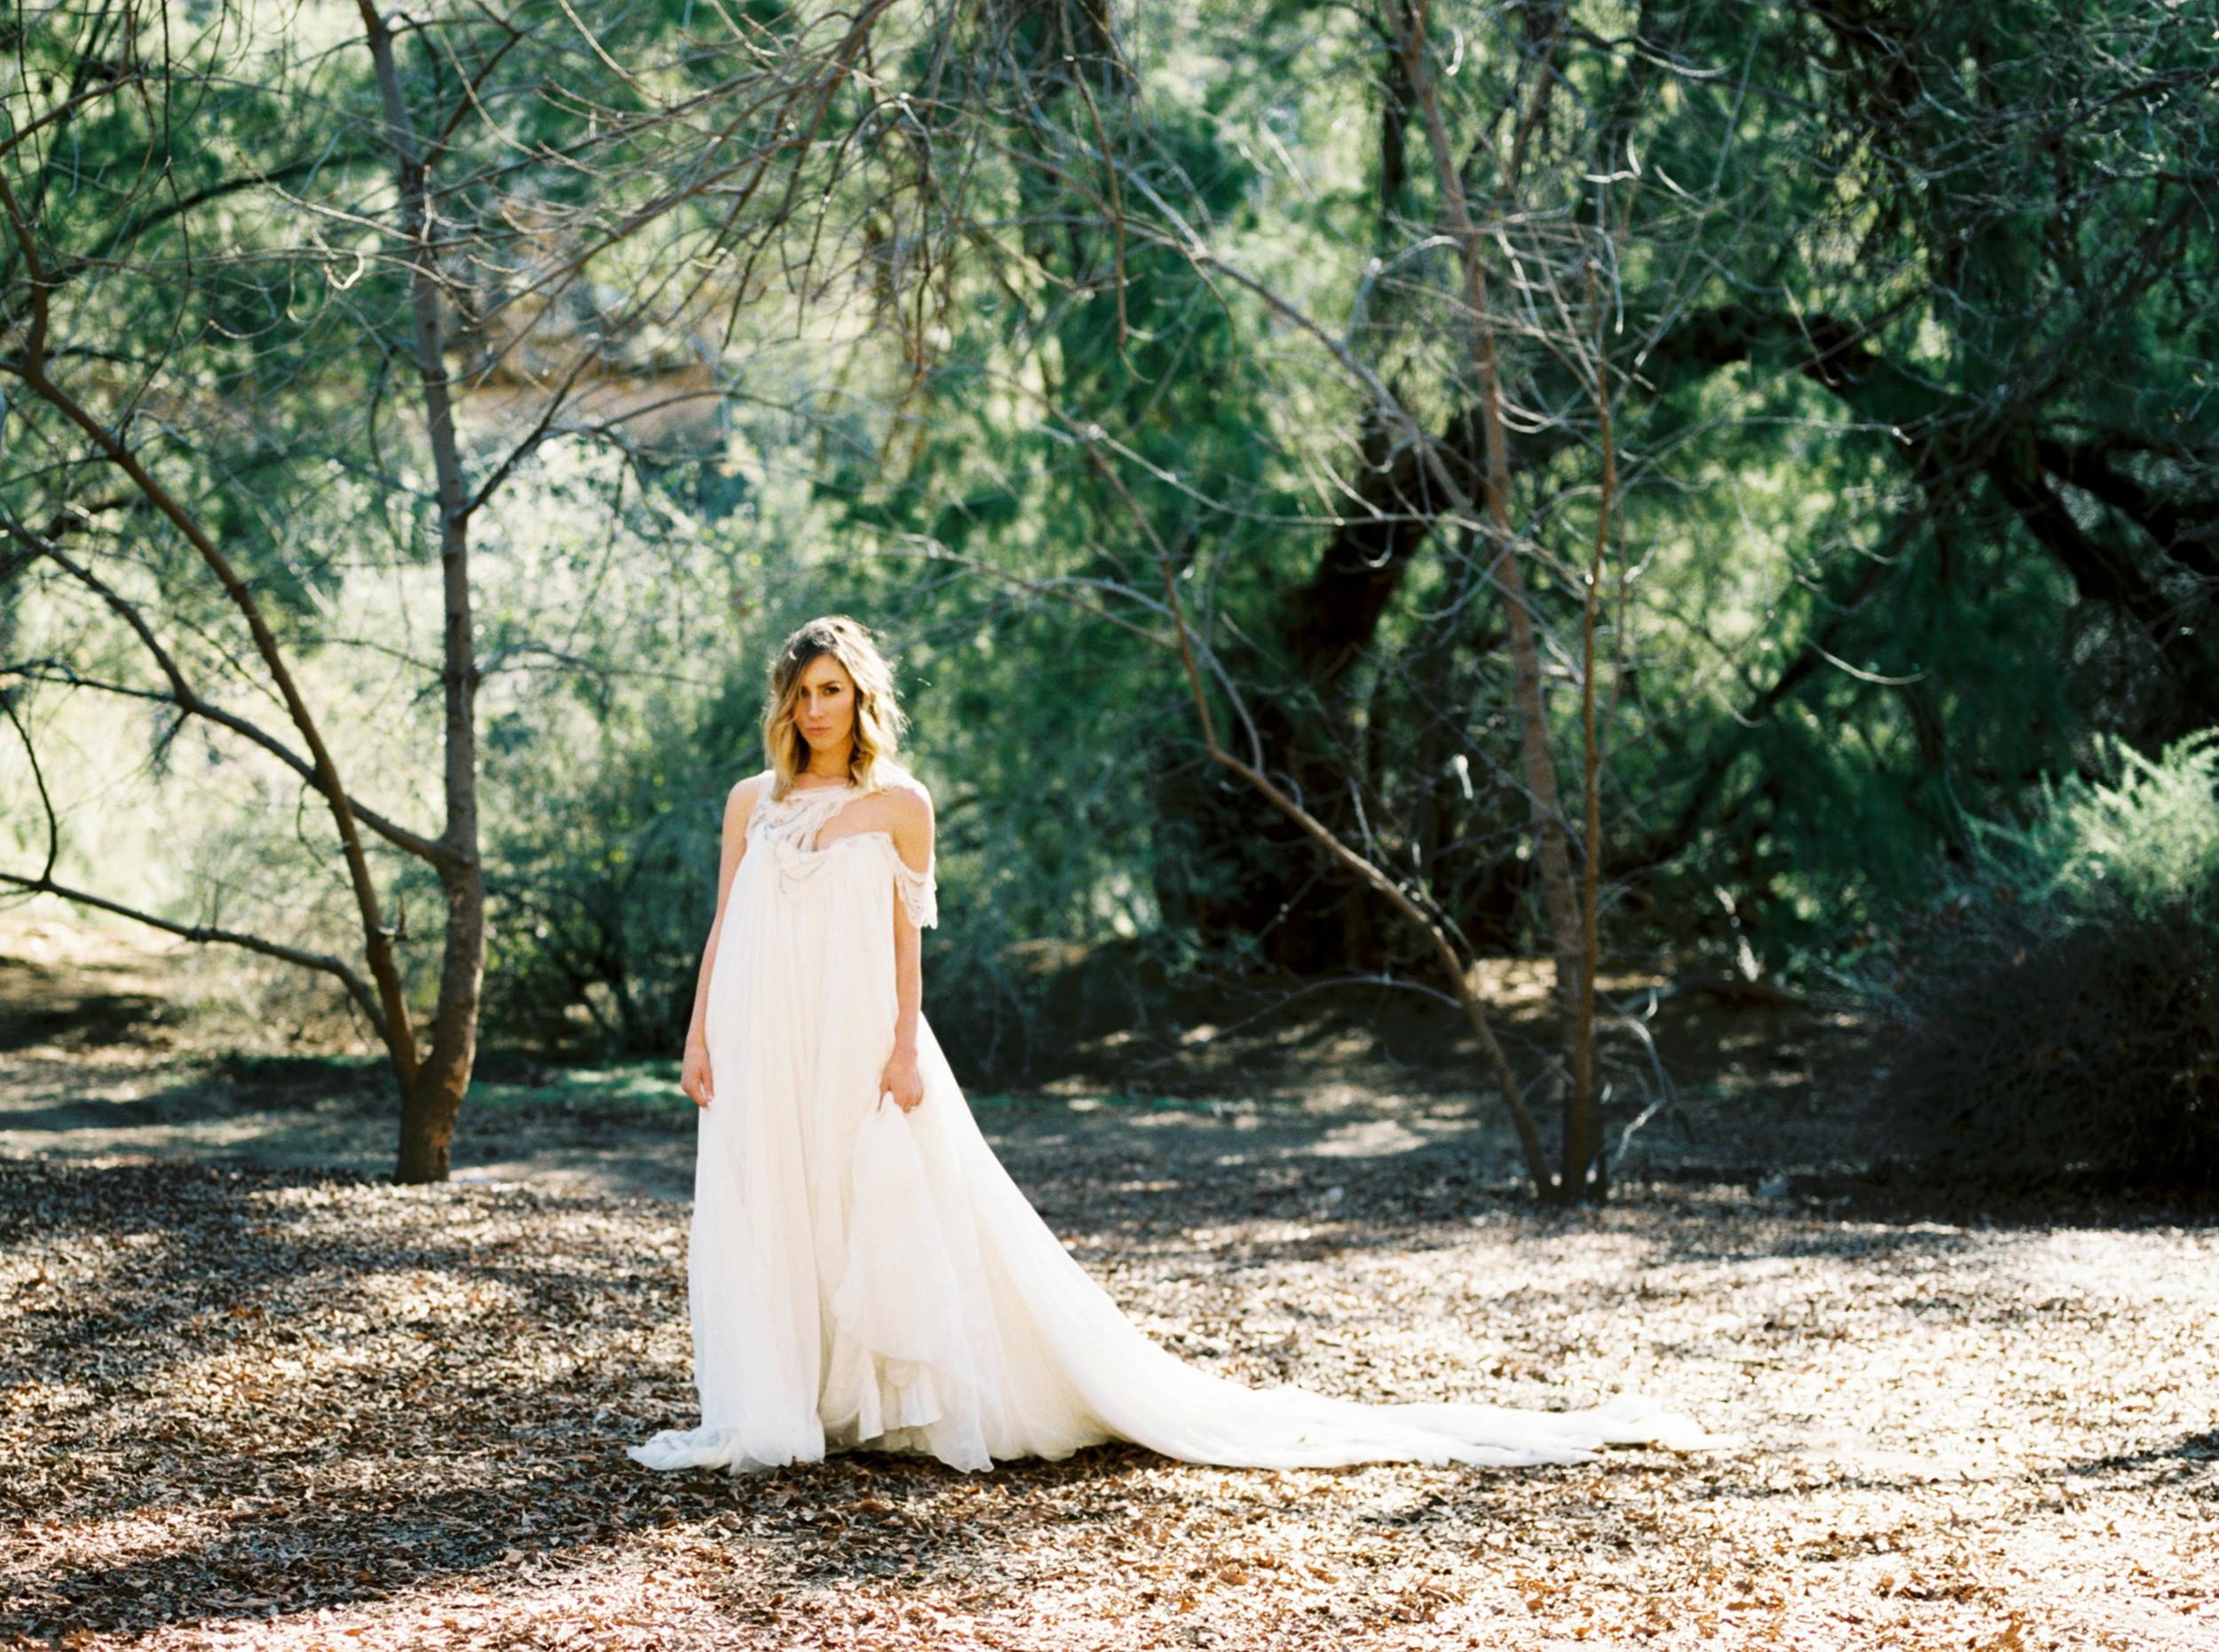 Danford-Photography-Bozeman-Montana-Arizona-Fine Art Film-Wedding-Engagement-Photographers-10.jpg